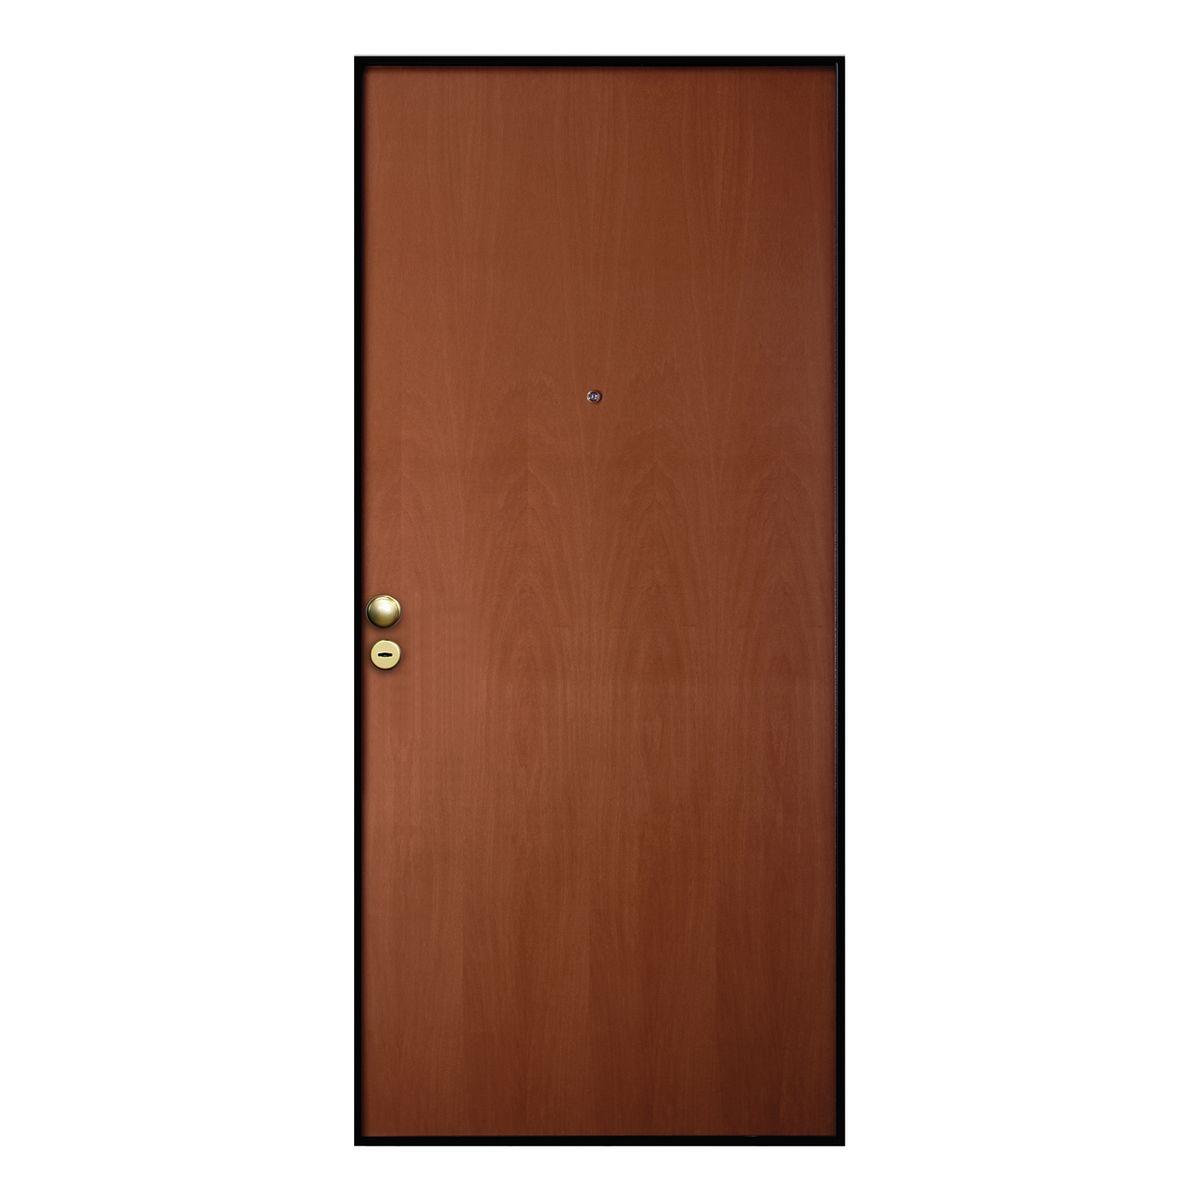 Costo porta blindata fabulous porta blindata gardesa with costo porta blindata good porte - Porte interno leroy merlin ...